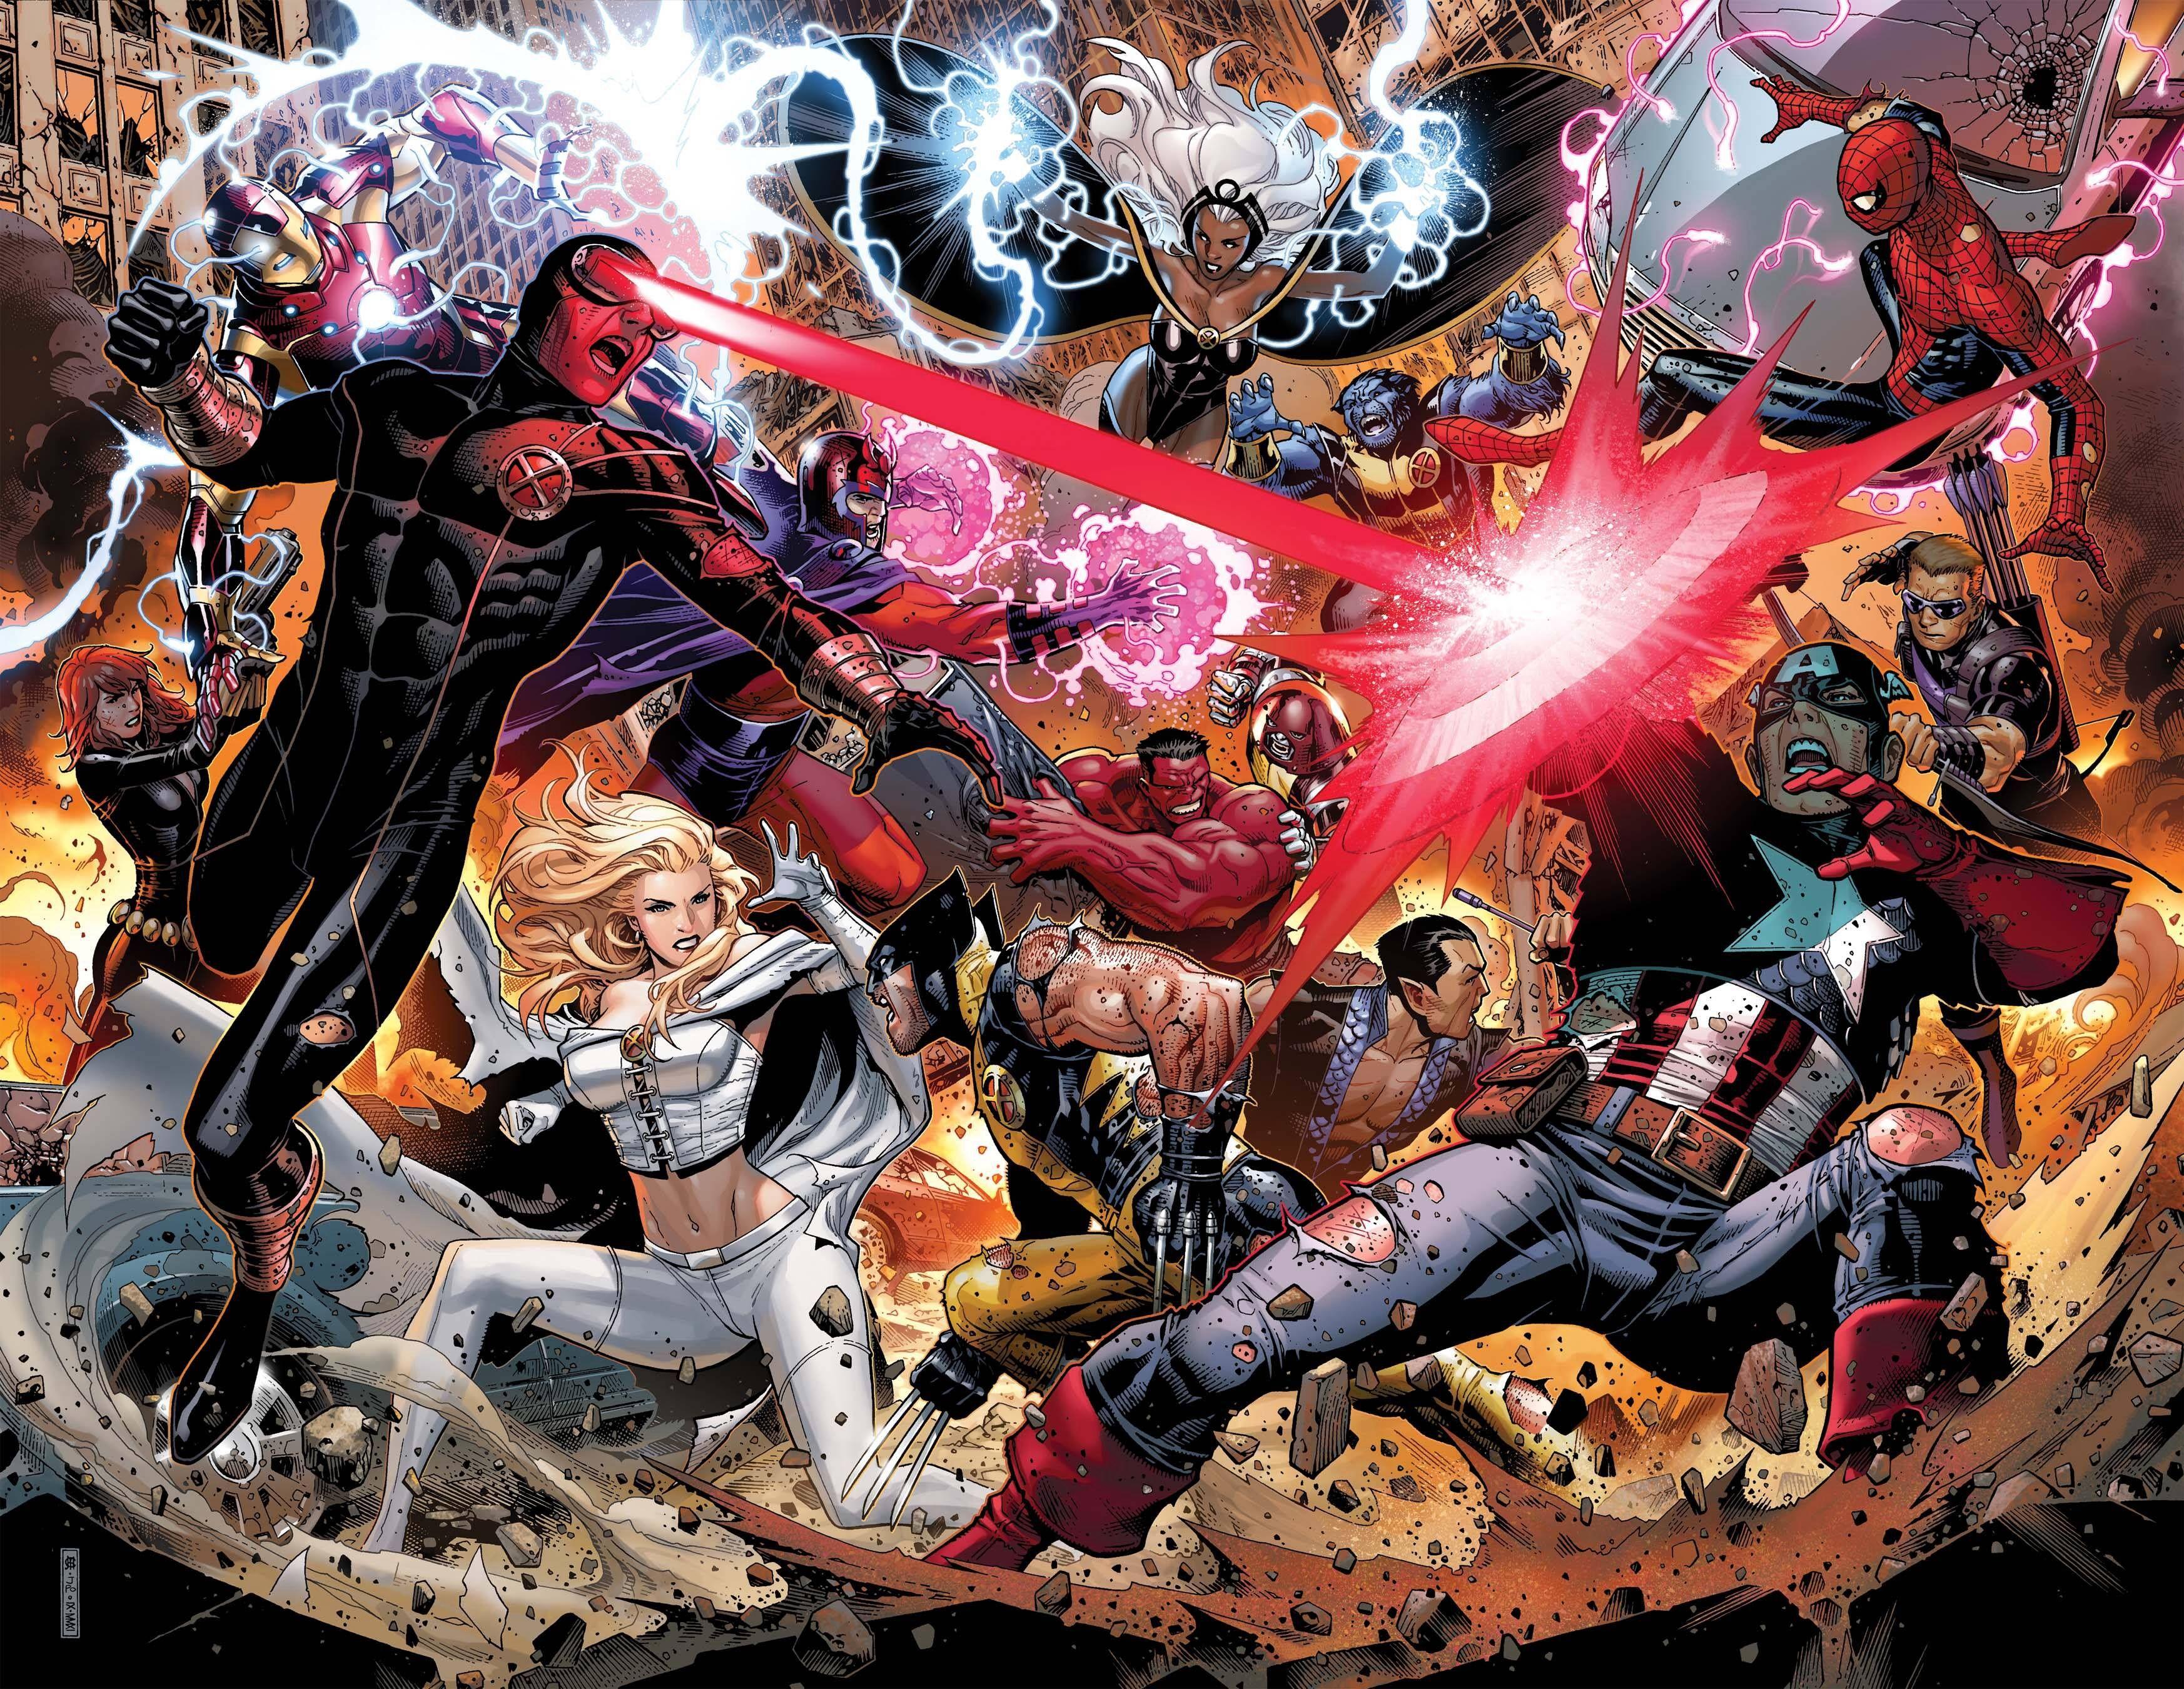 Avengers Vs X Men By Jim Cheung Avengers Comics Avengers Art